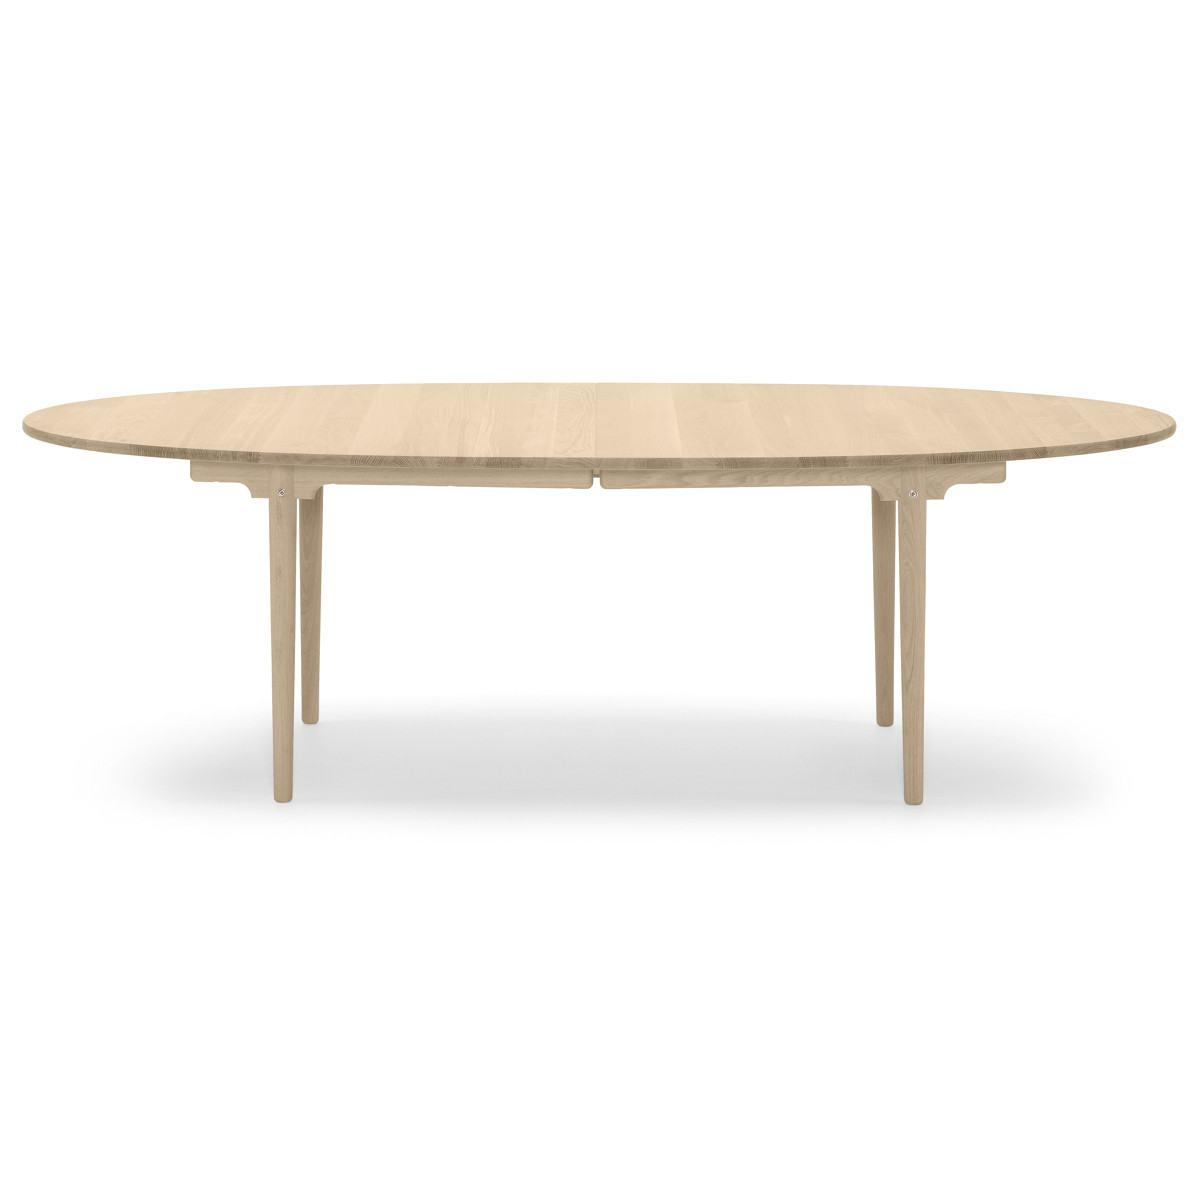 Carl Hansen CH339 Dining Table